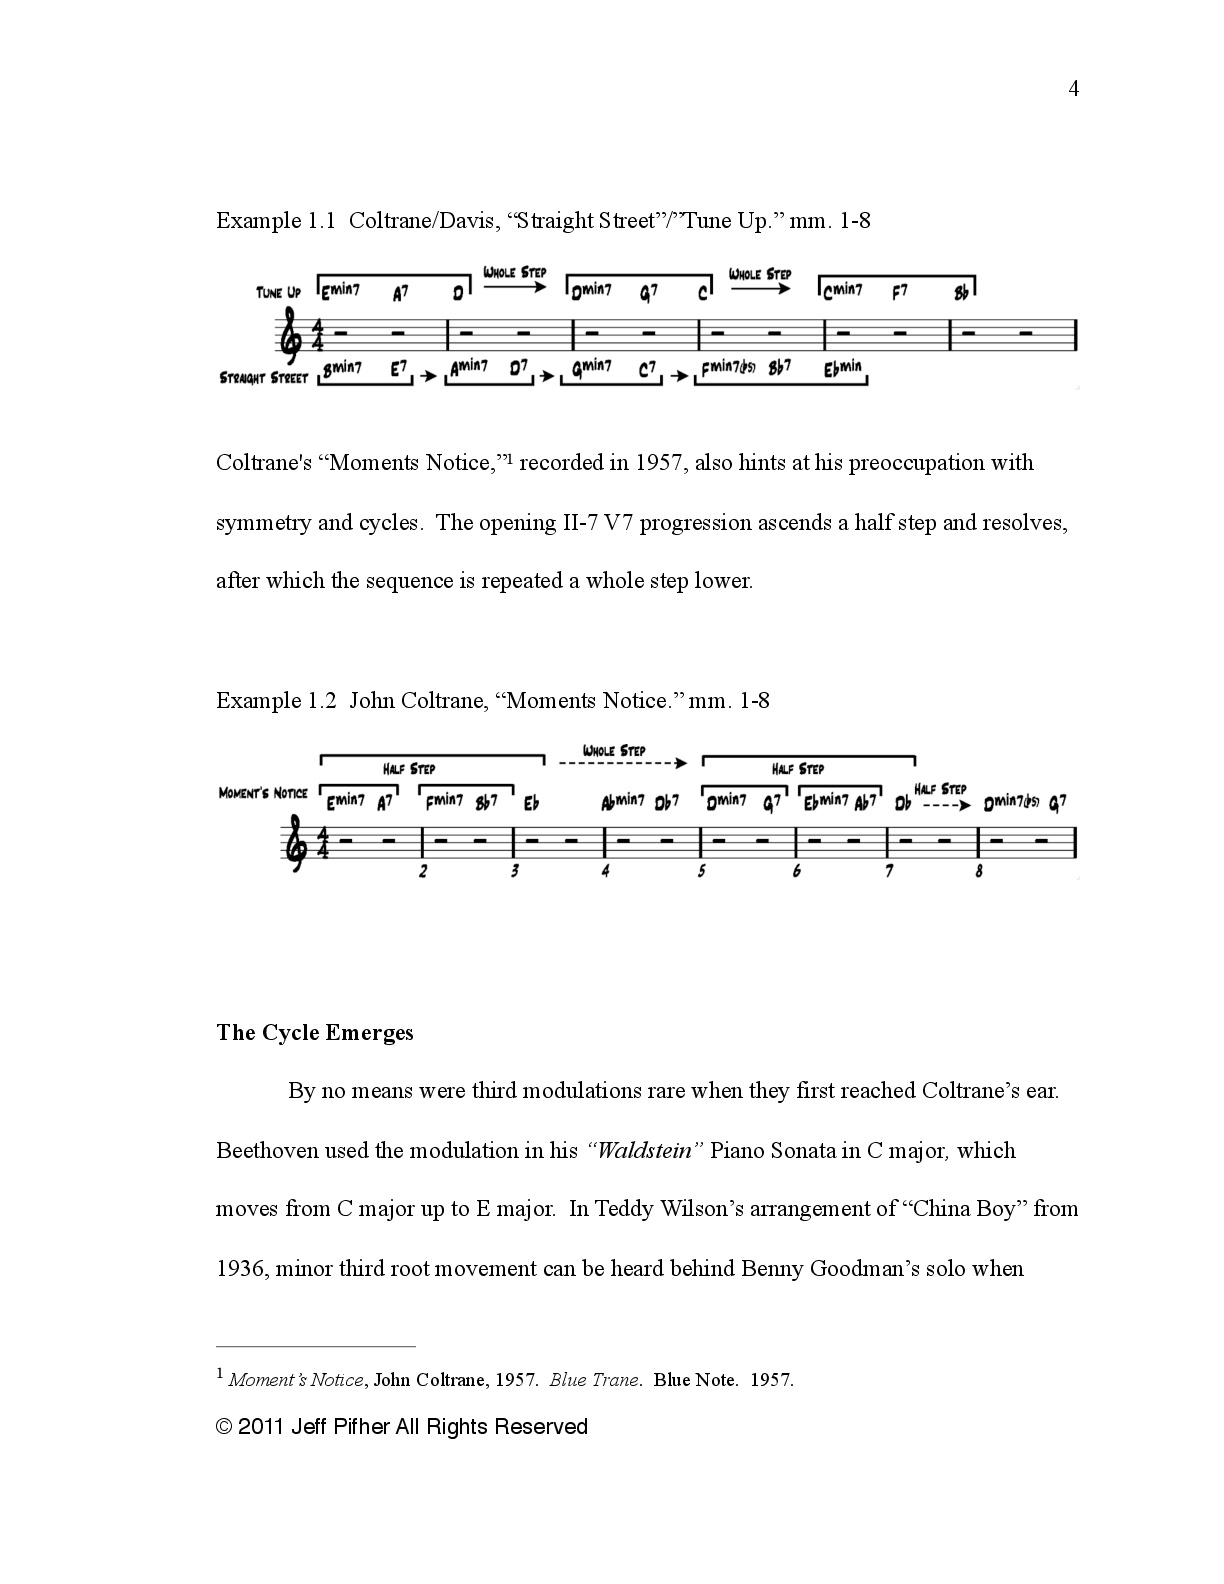 Jeff-Pifher-Academic-Series-Coltrane-Cycles-004.jpg